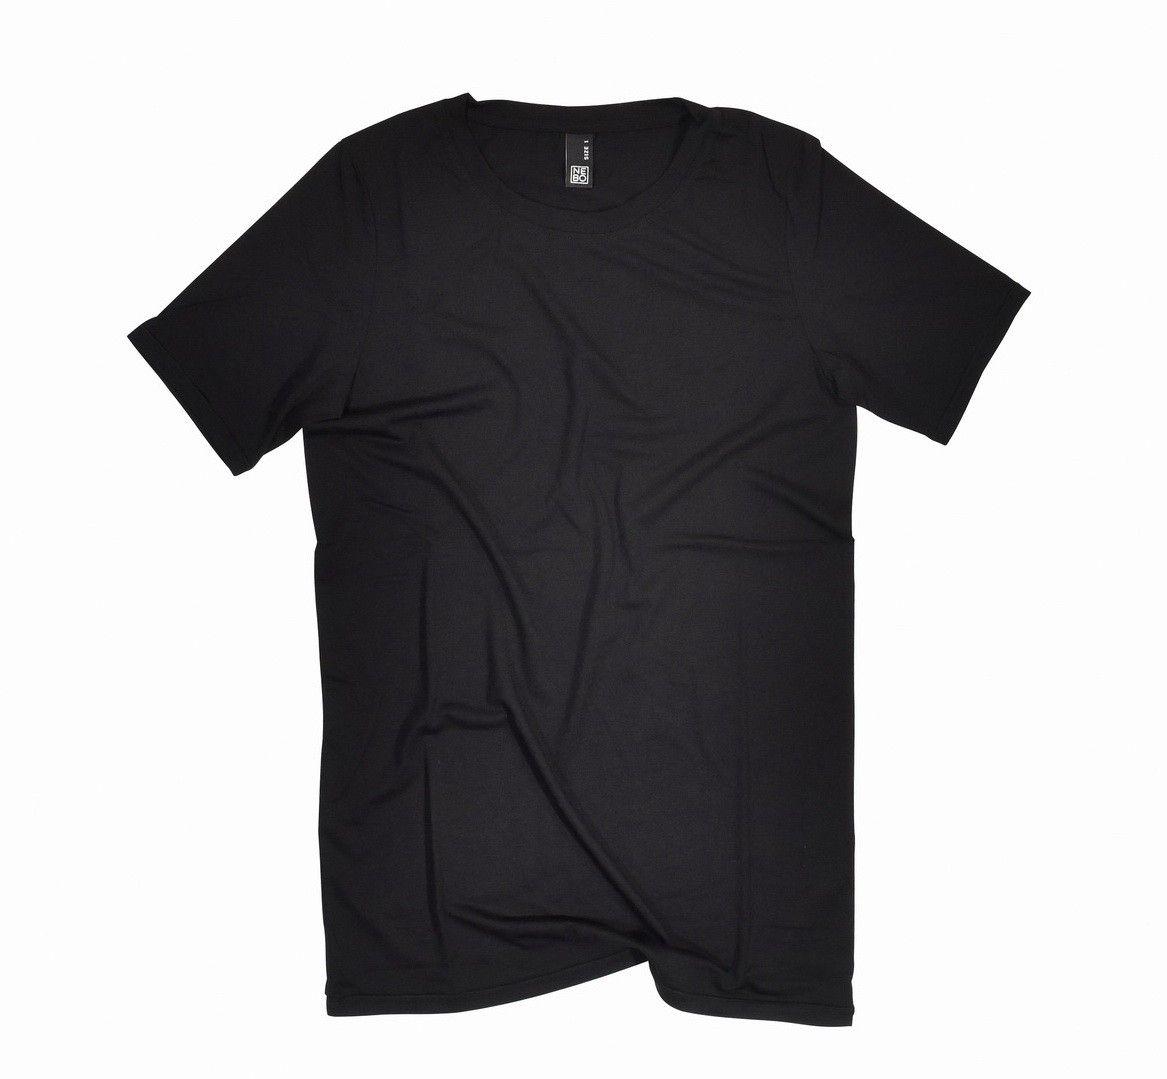 NEBO - Herren T-Shirt - Joe - Black